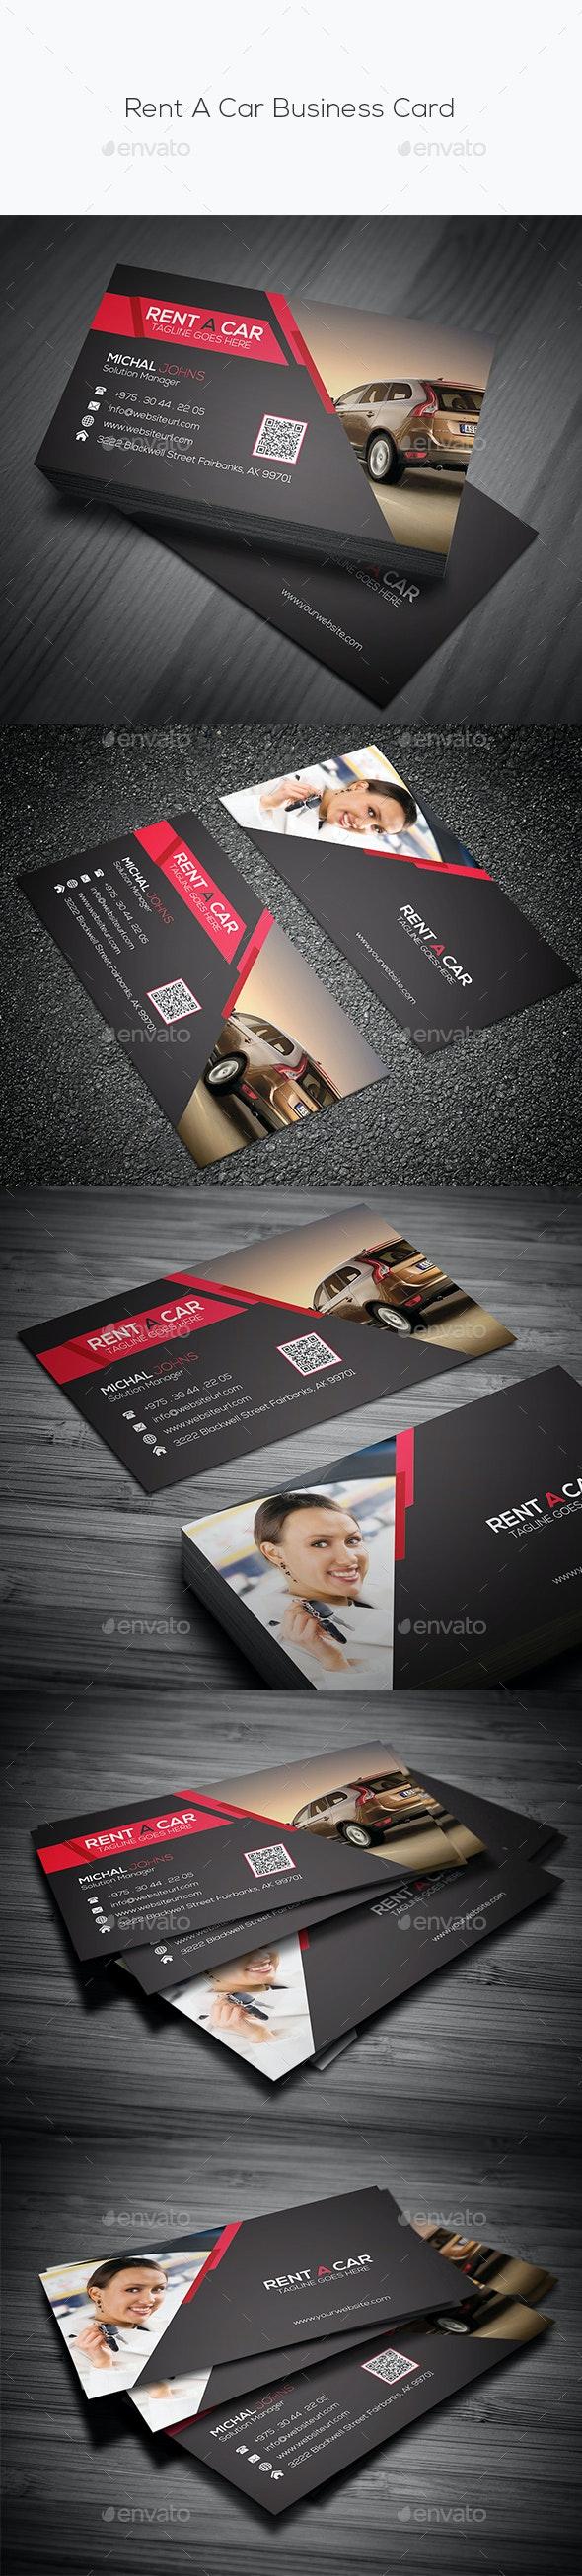 Rent A Car Business Card - Business Cards Print Templates